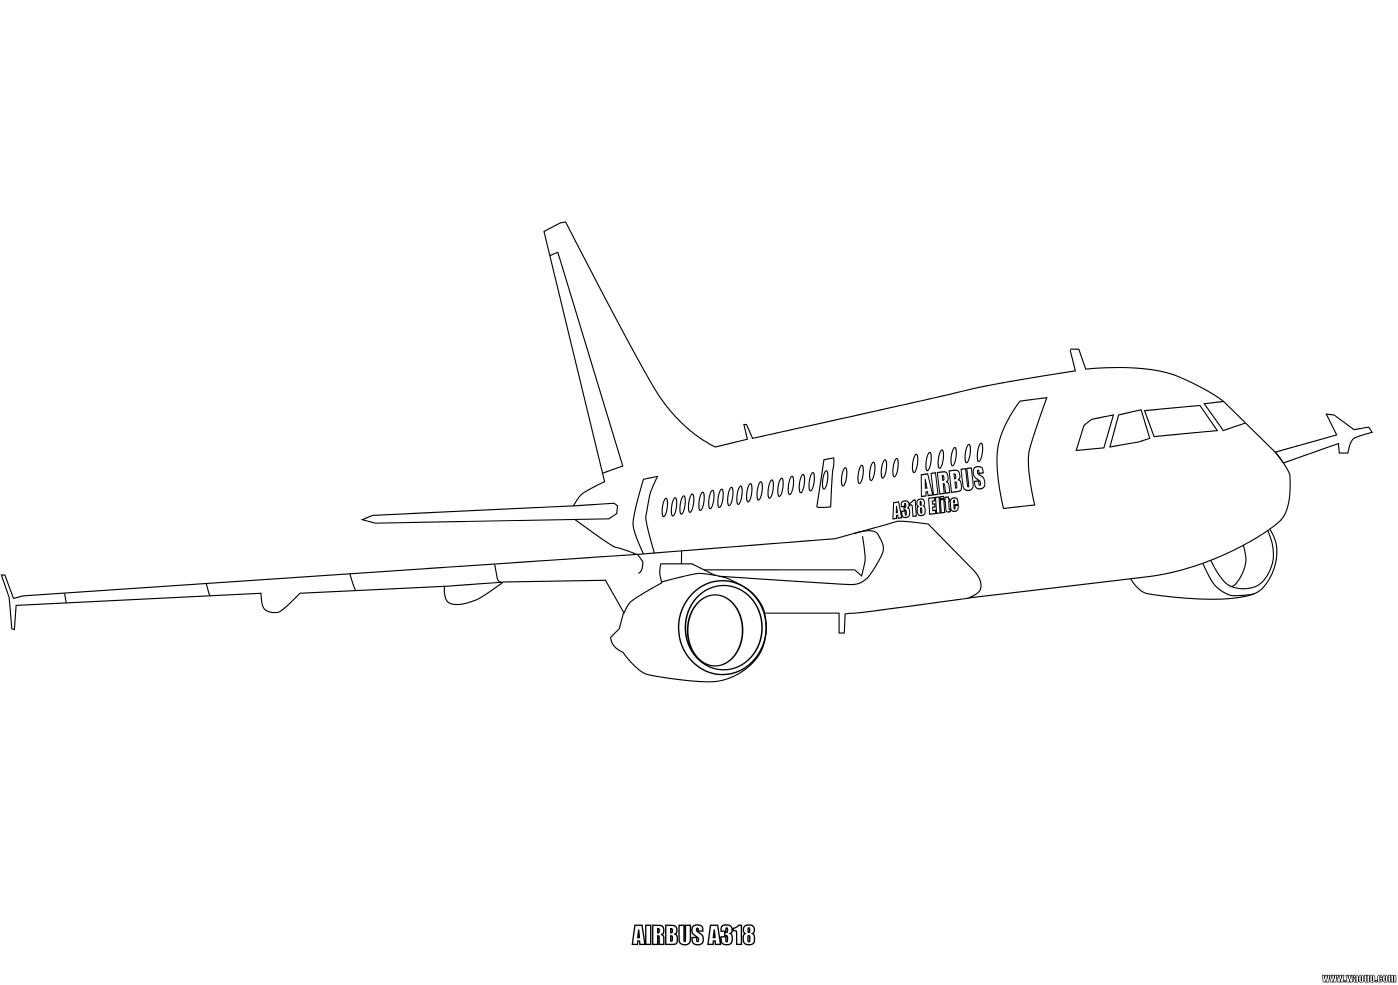 A380 airbus coloriage de l avion a380 airbus imprimer - Avion en dessin ...